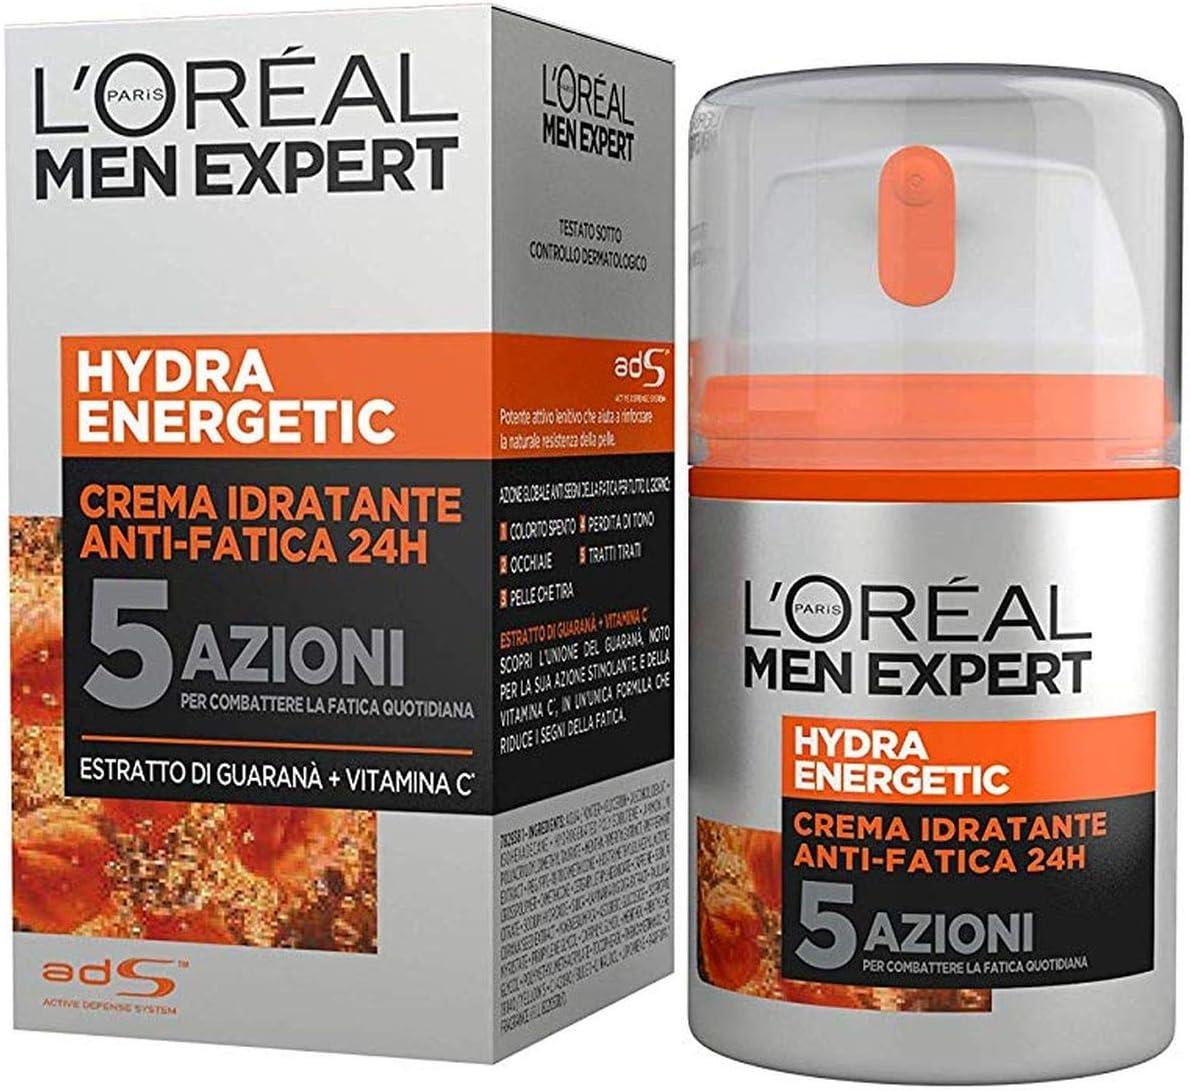 L'oreal men expert scrub viso pure power